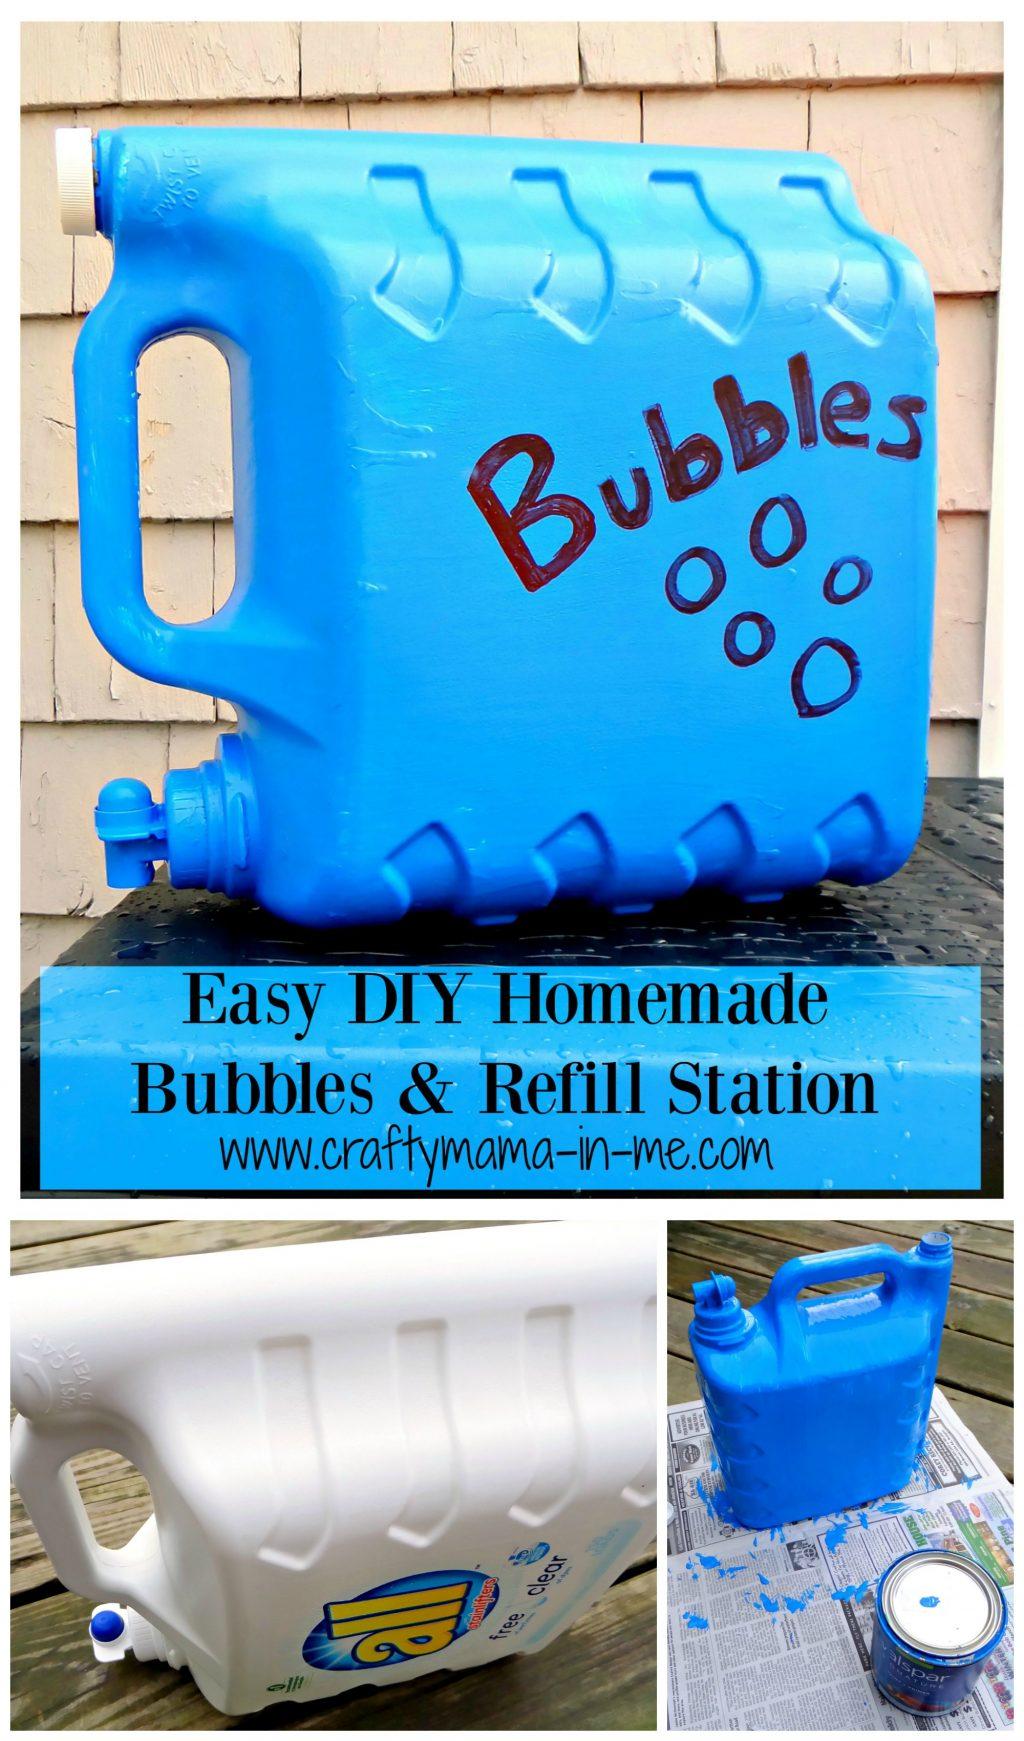 Easy Homemade Playdough Recipe: Easy DIY Homemade Bubbles And Refill Station